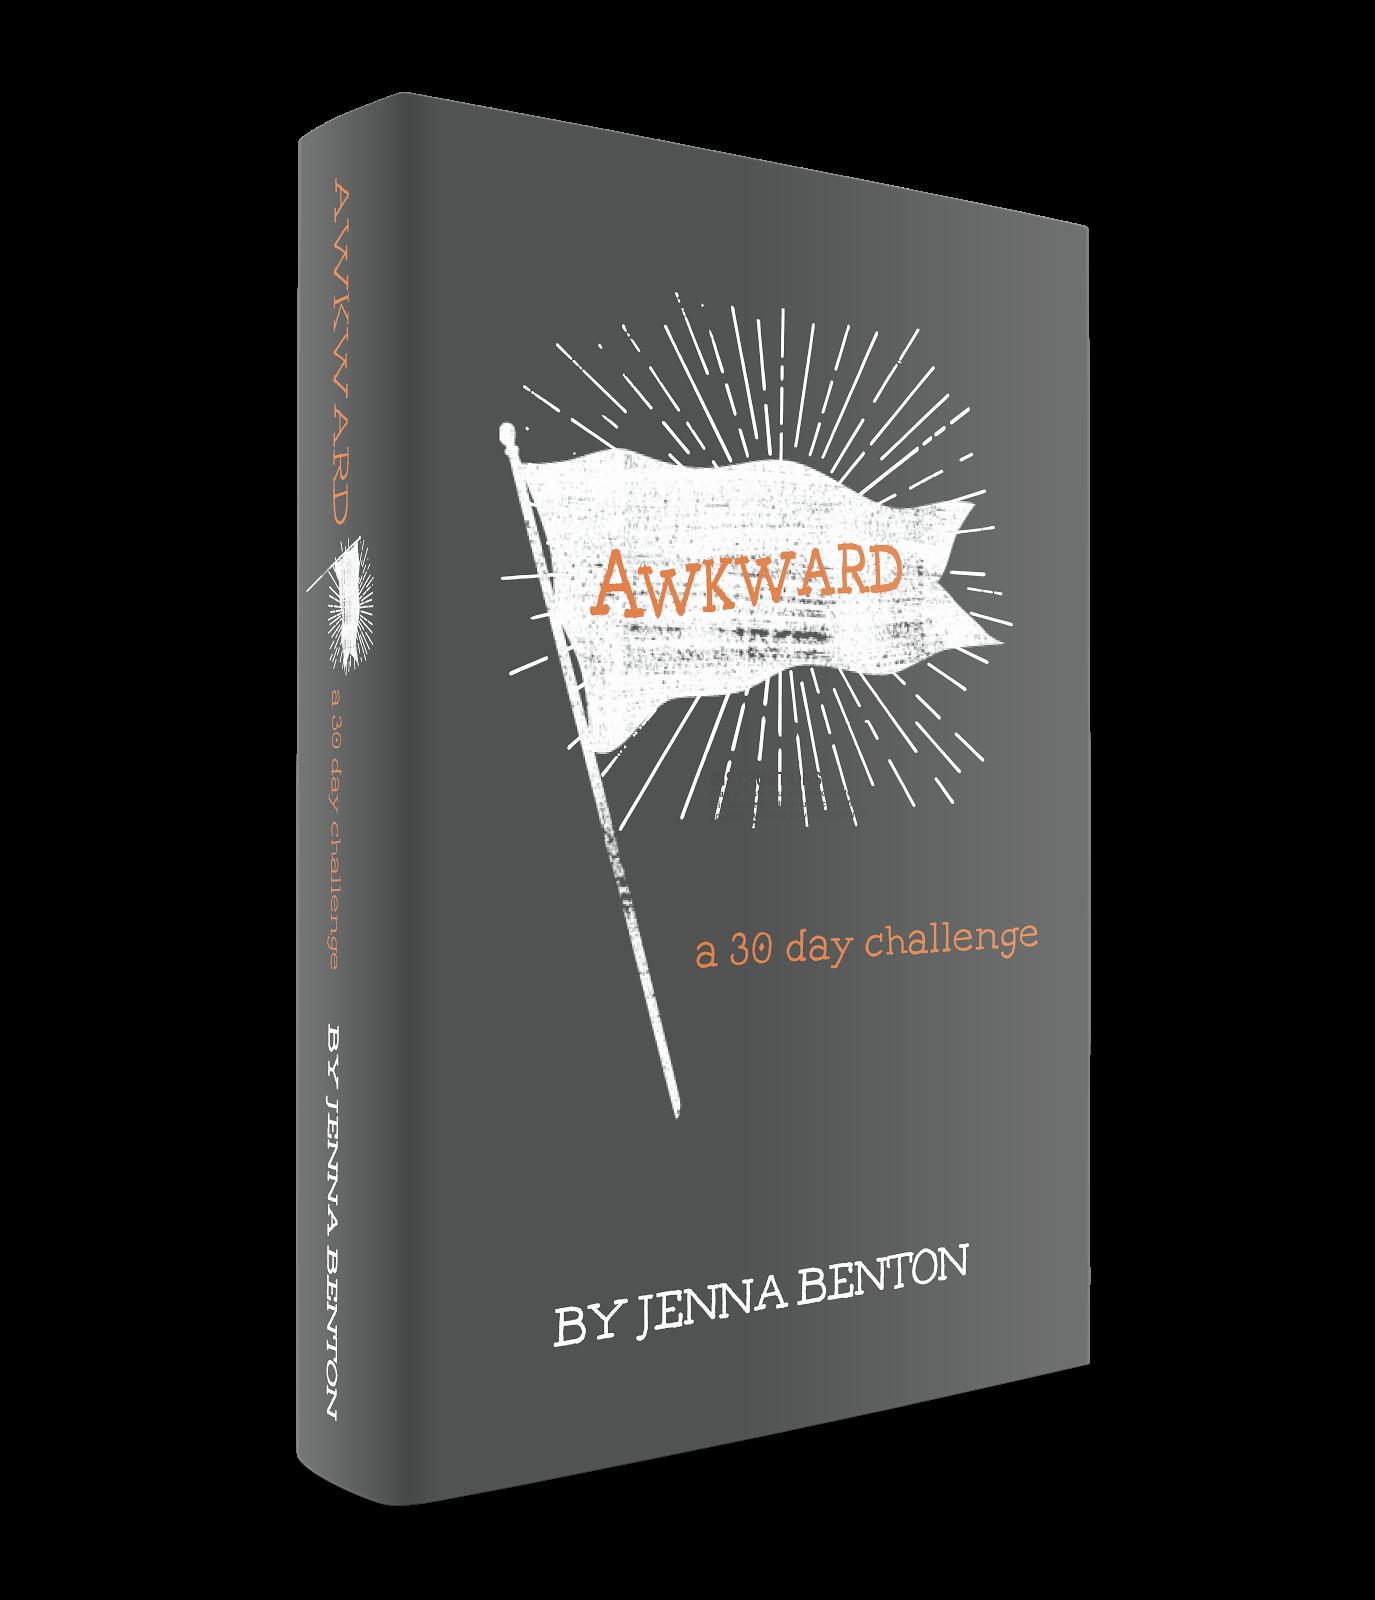 AWKWARD: a 30 day challenge